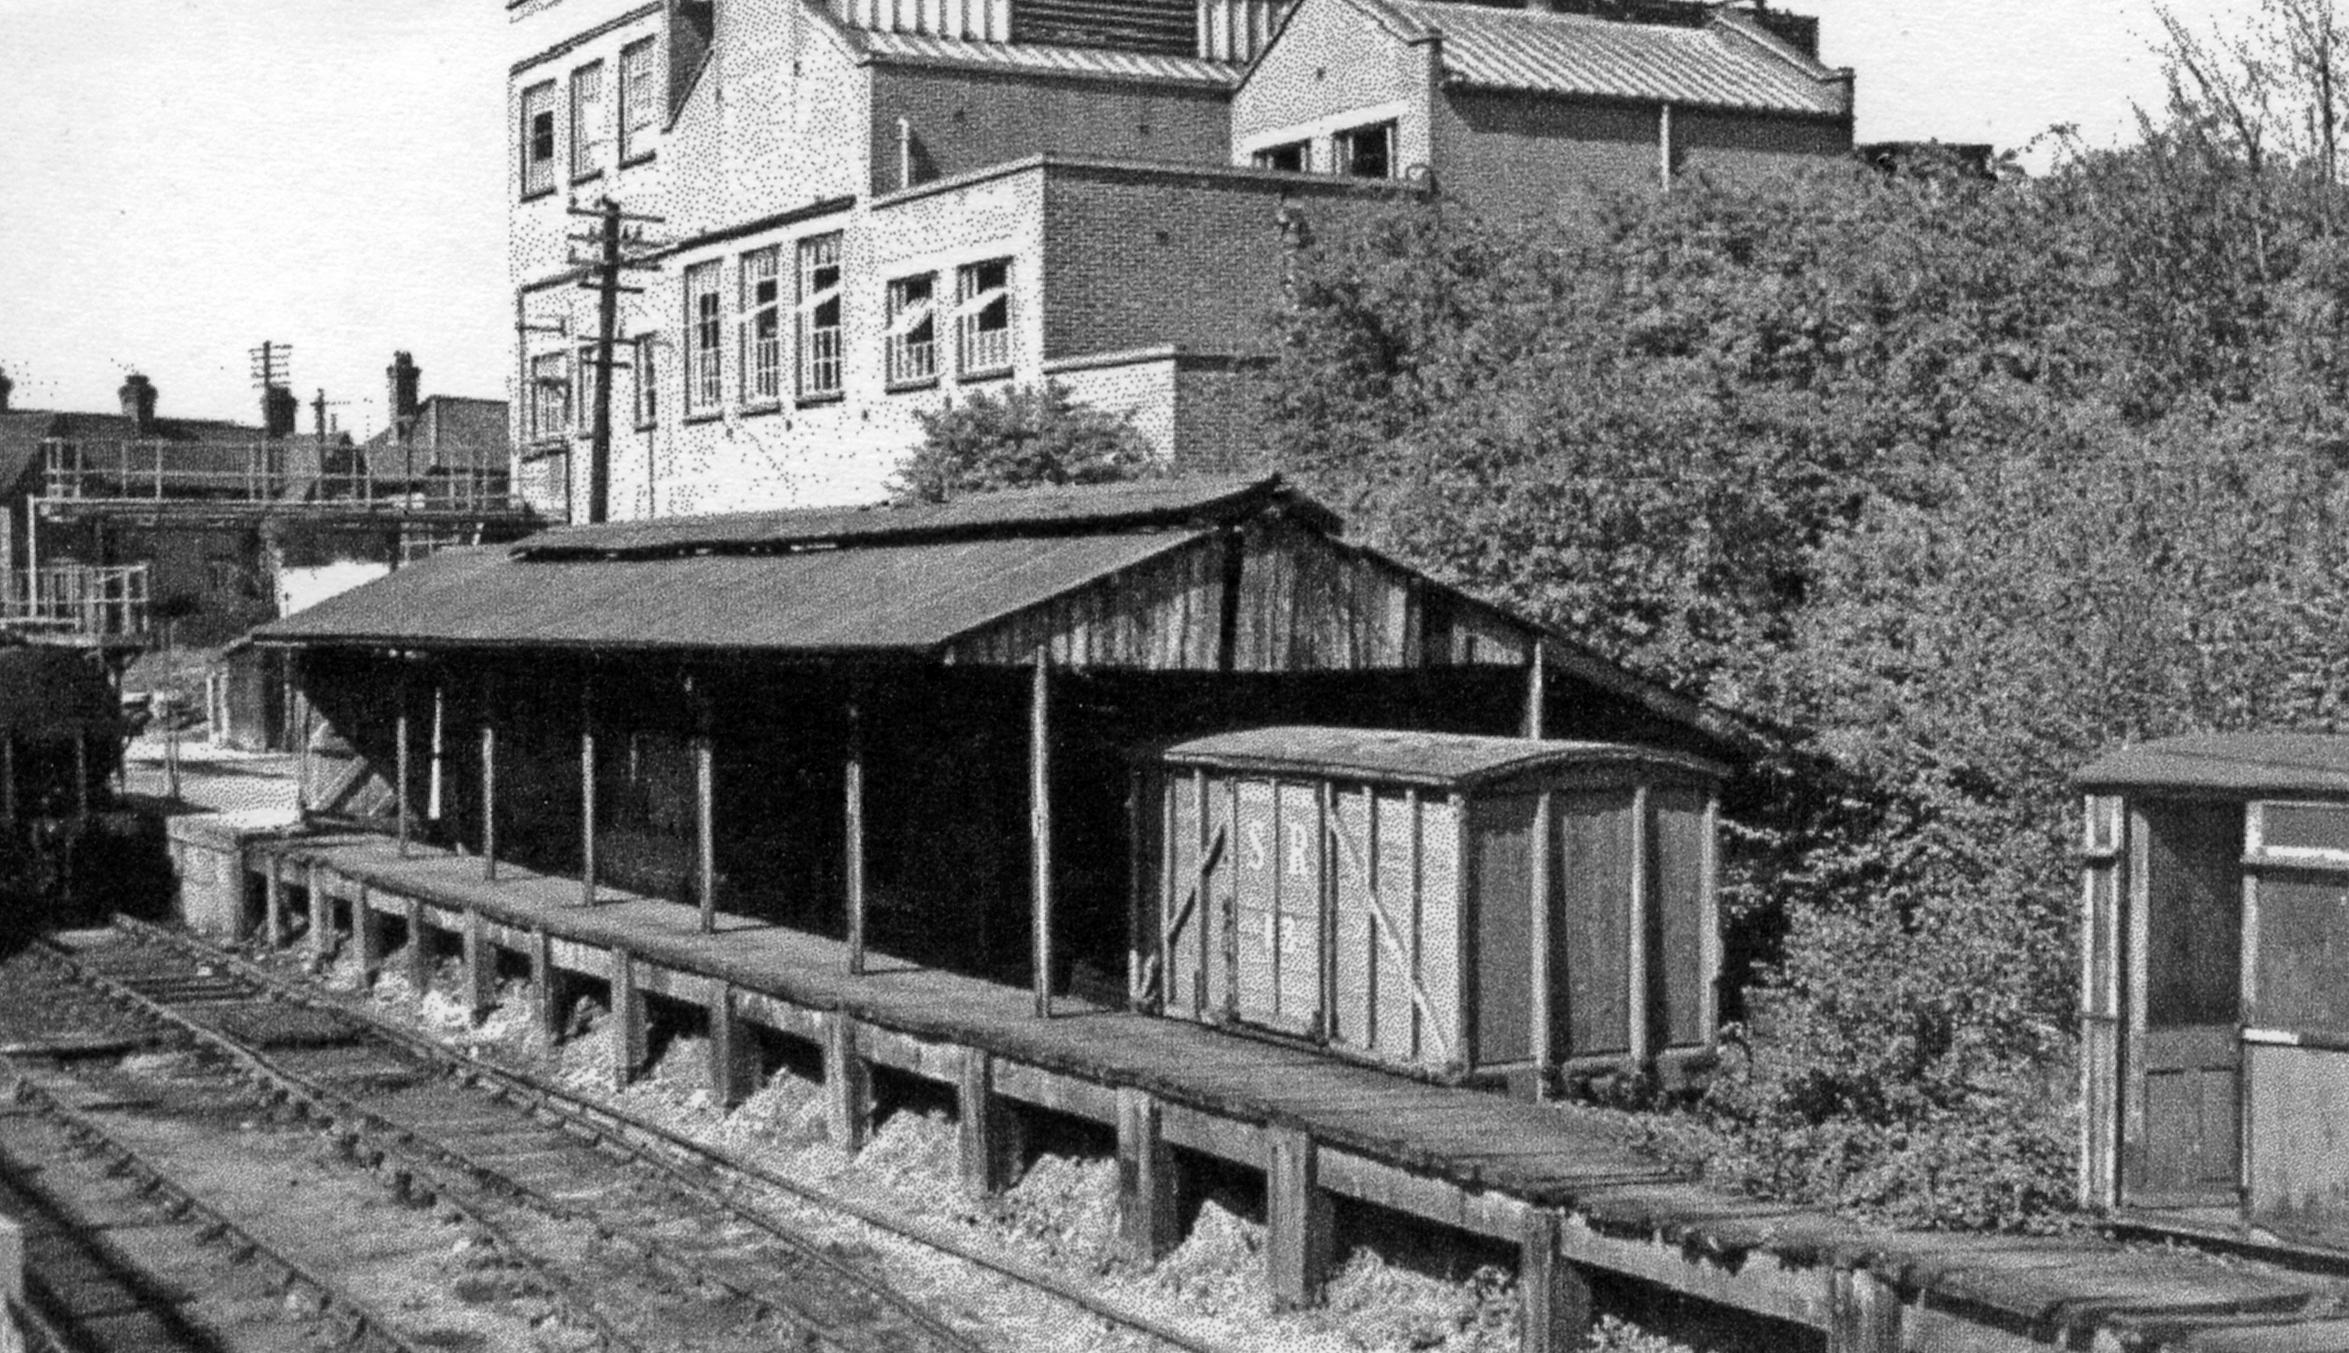 Halesworth Line. 2 Southwold Railway Station Photo